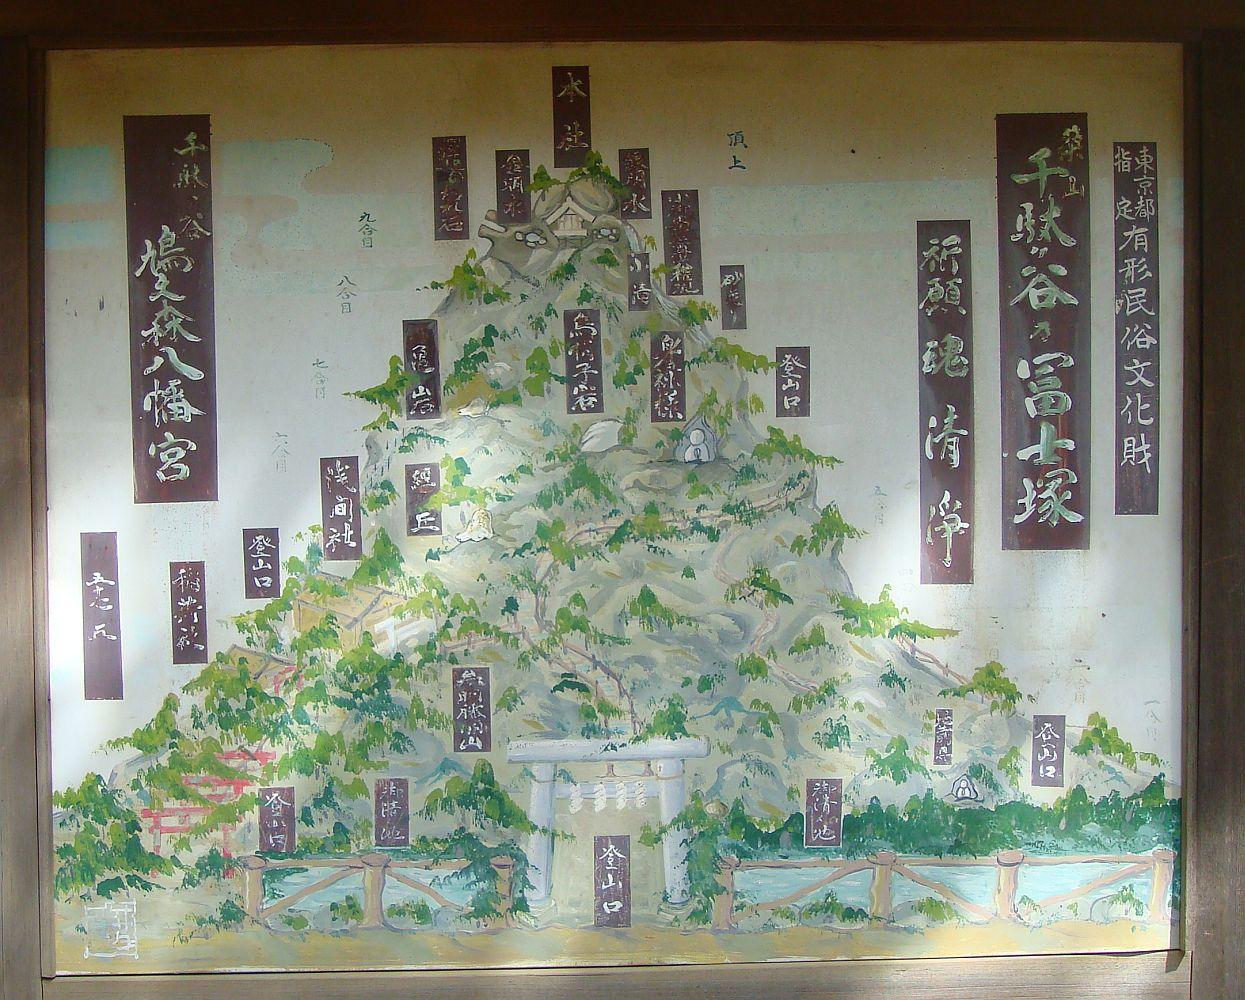 富士塚の案内図